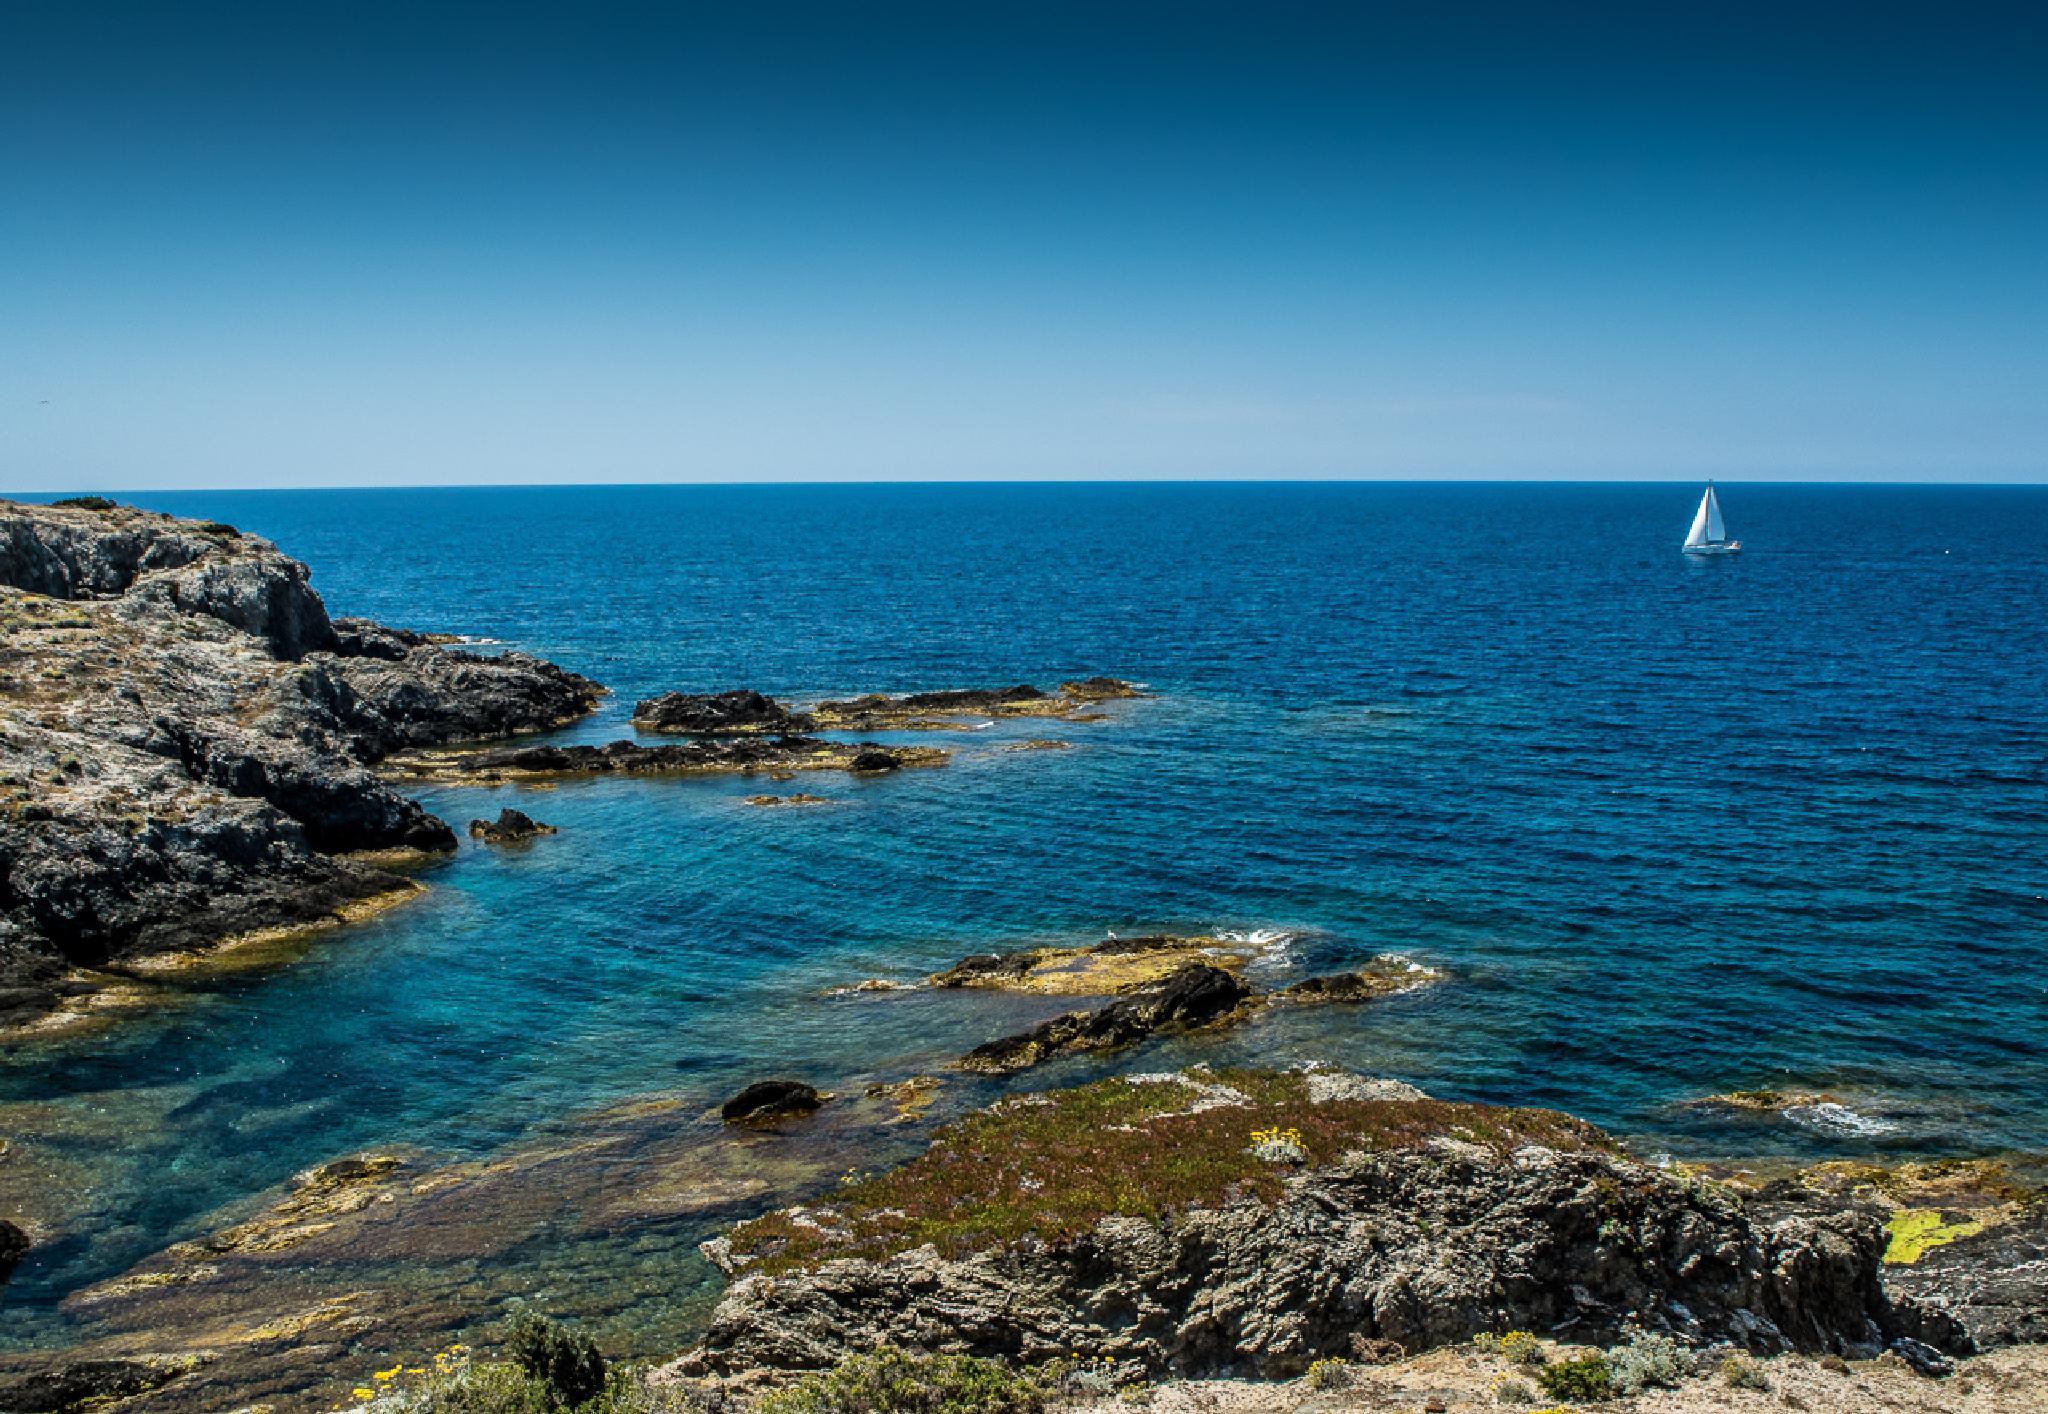 Côte d'azur by FSFoto